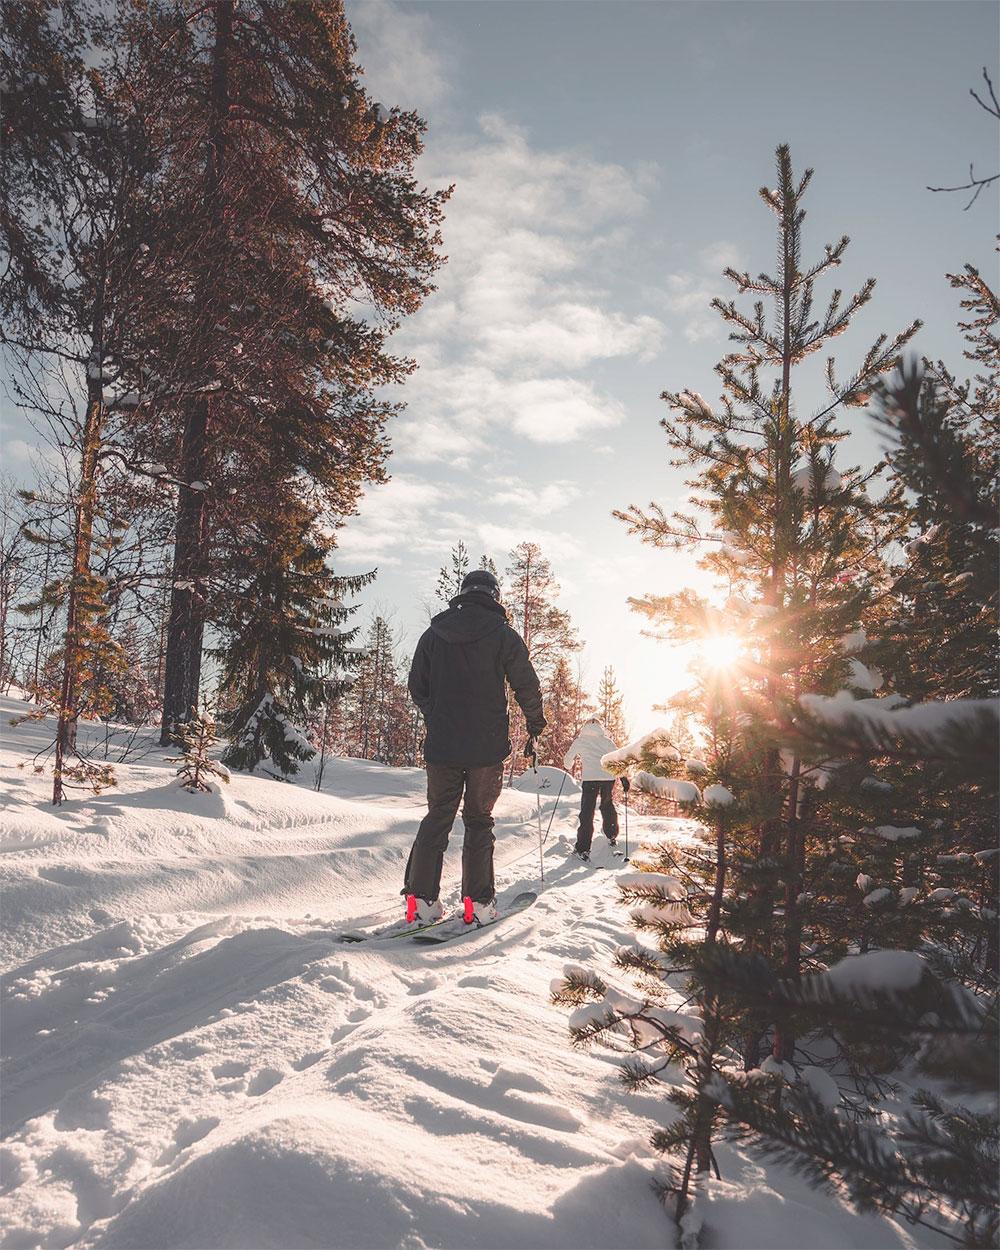 Visitate una pista da sci asciutta prima di iniziare